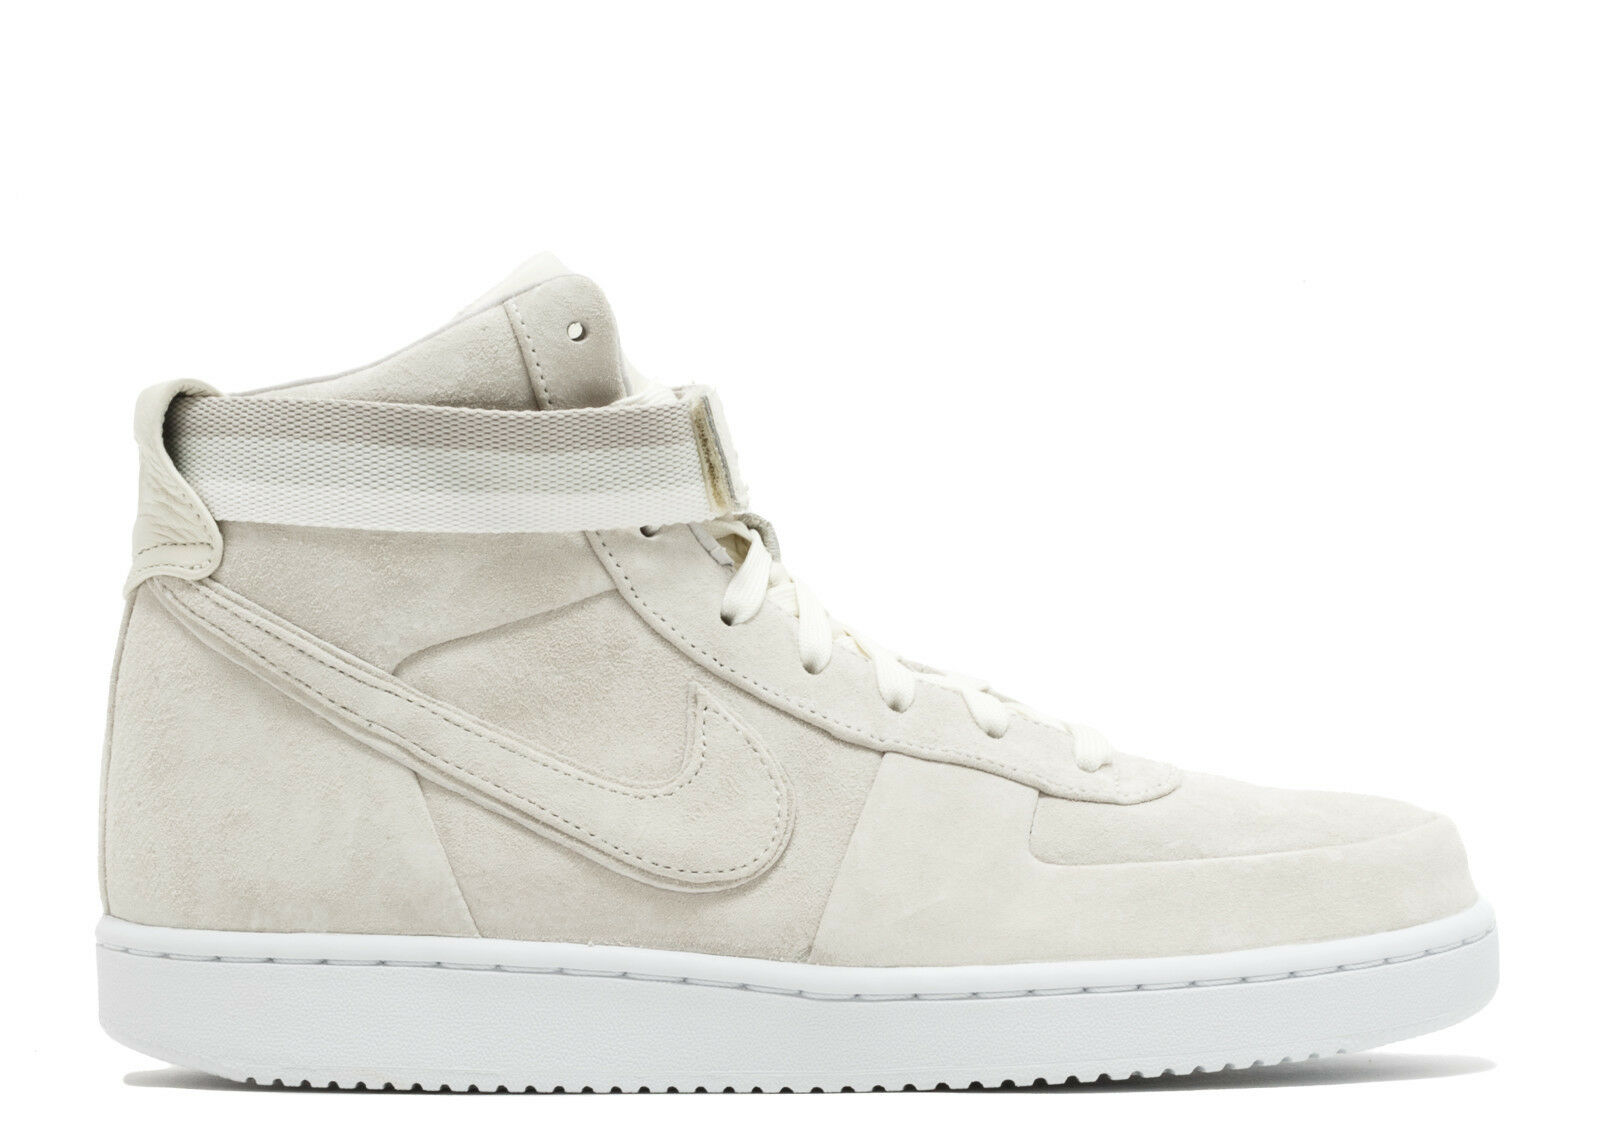 Nike Vandal High PRM SZ 9 John Elliott White Sail Off White Elliott Premium Suede AH7171-101 9e9af9